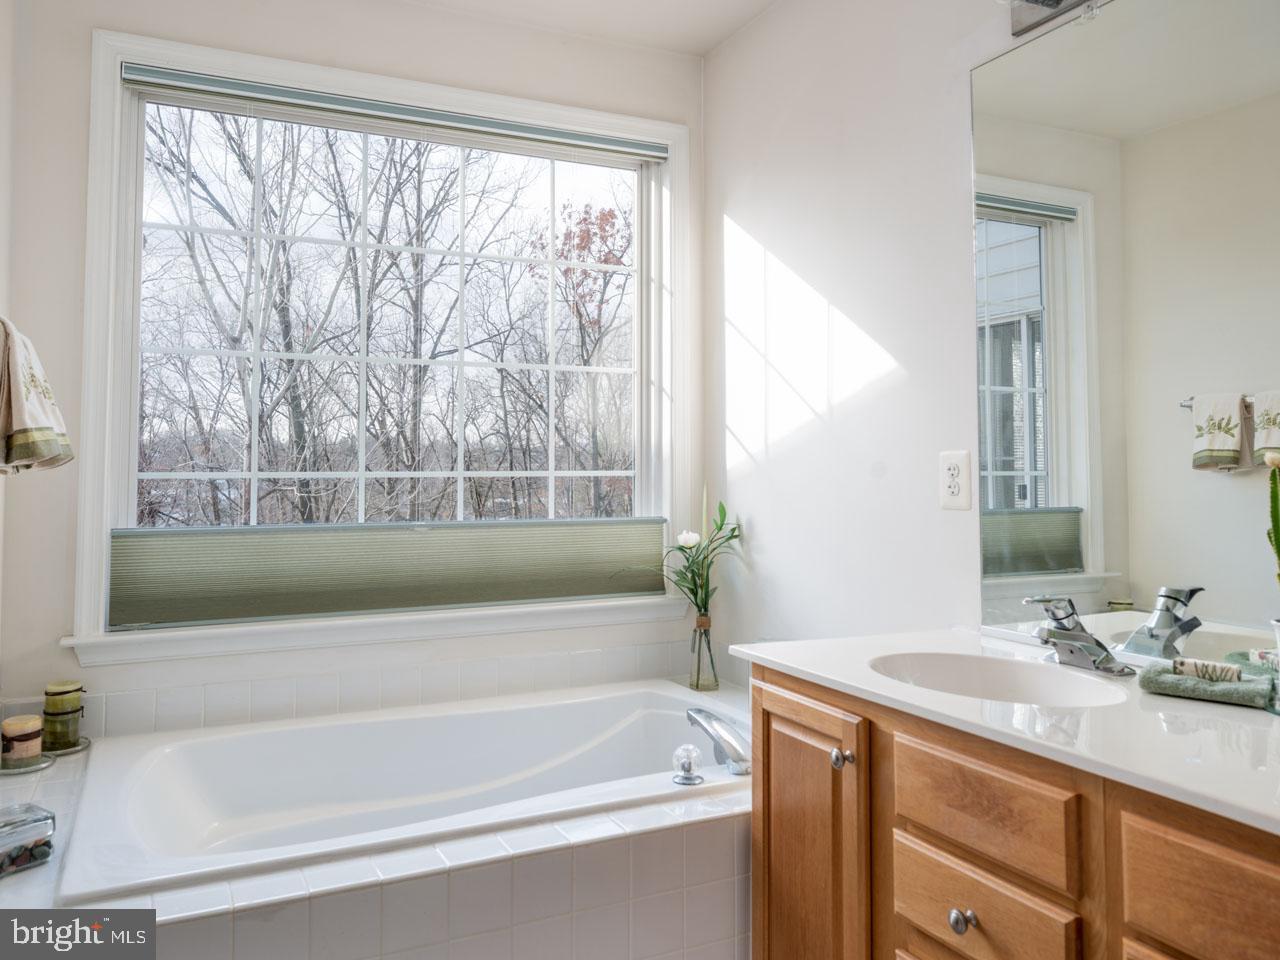 VAFX1104336-302201657712-2021-07-16-19-45-24  |   | Alexandria Delaware Real Estate For Sale | MLS# Vafx1104336  - Best of Northern Virginia